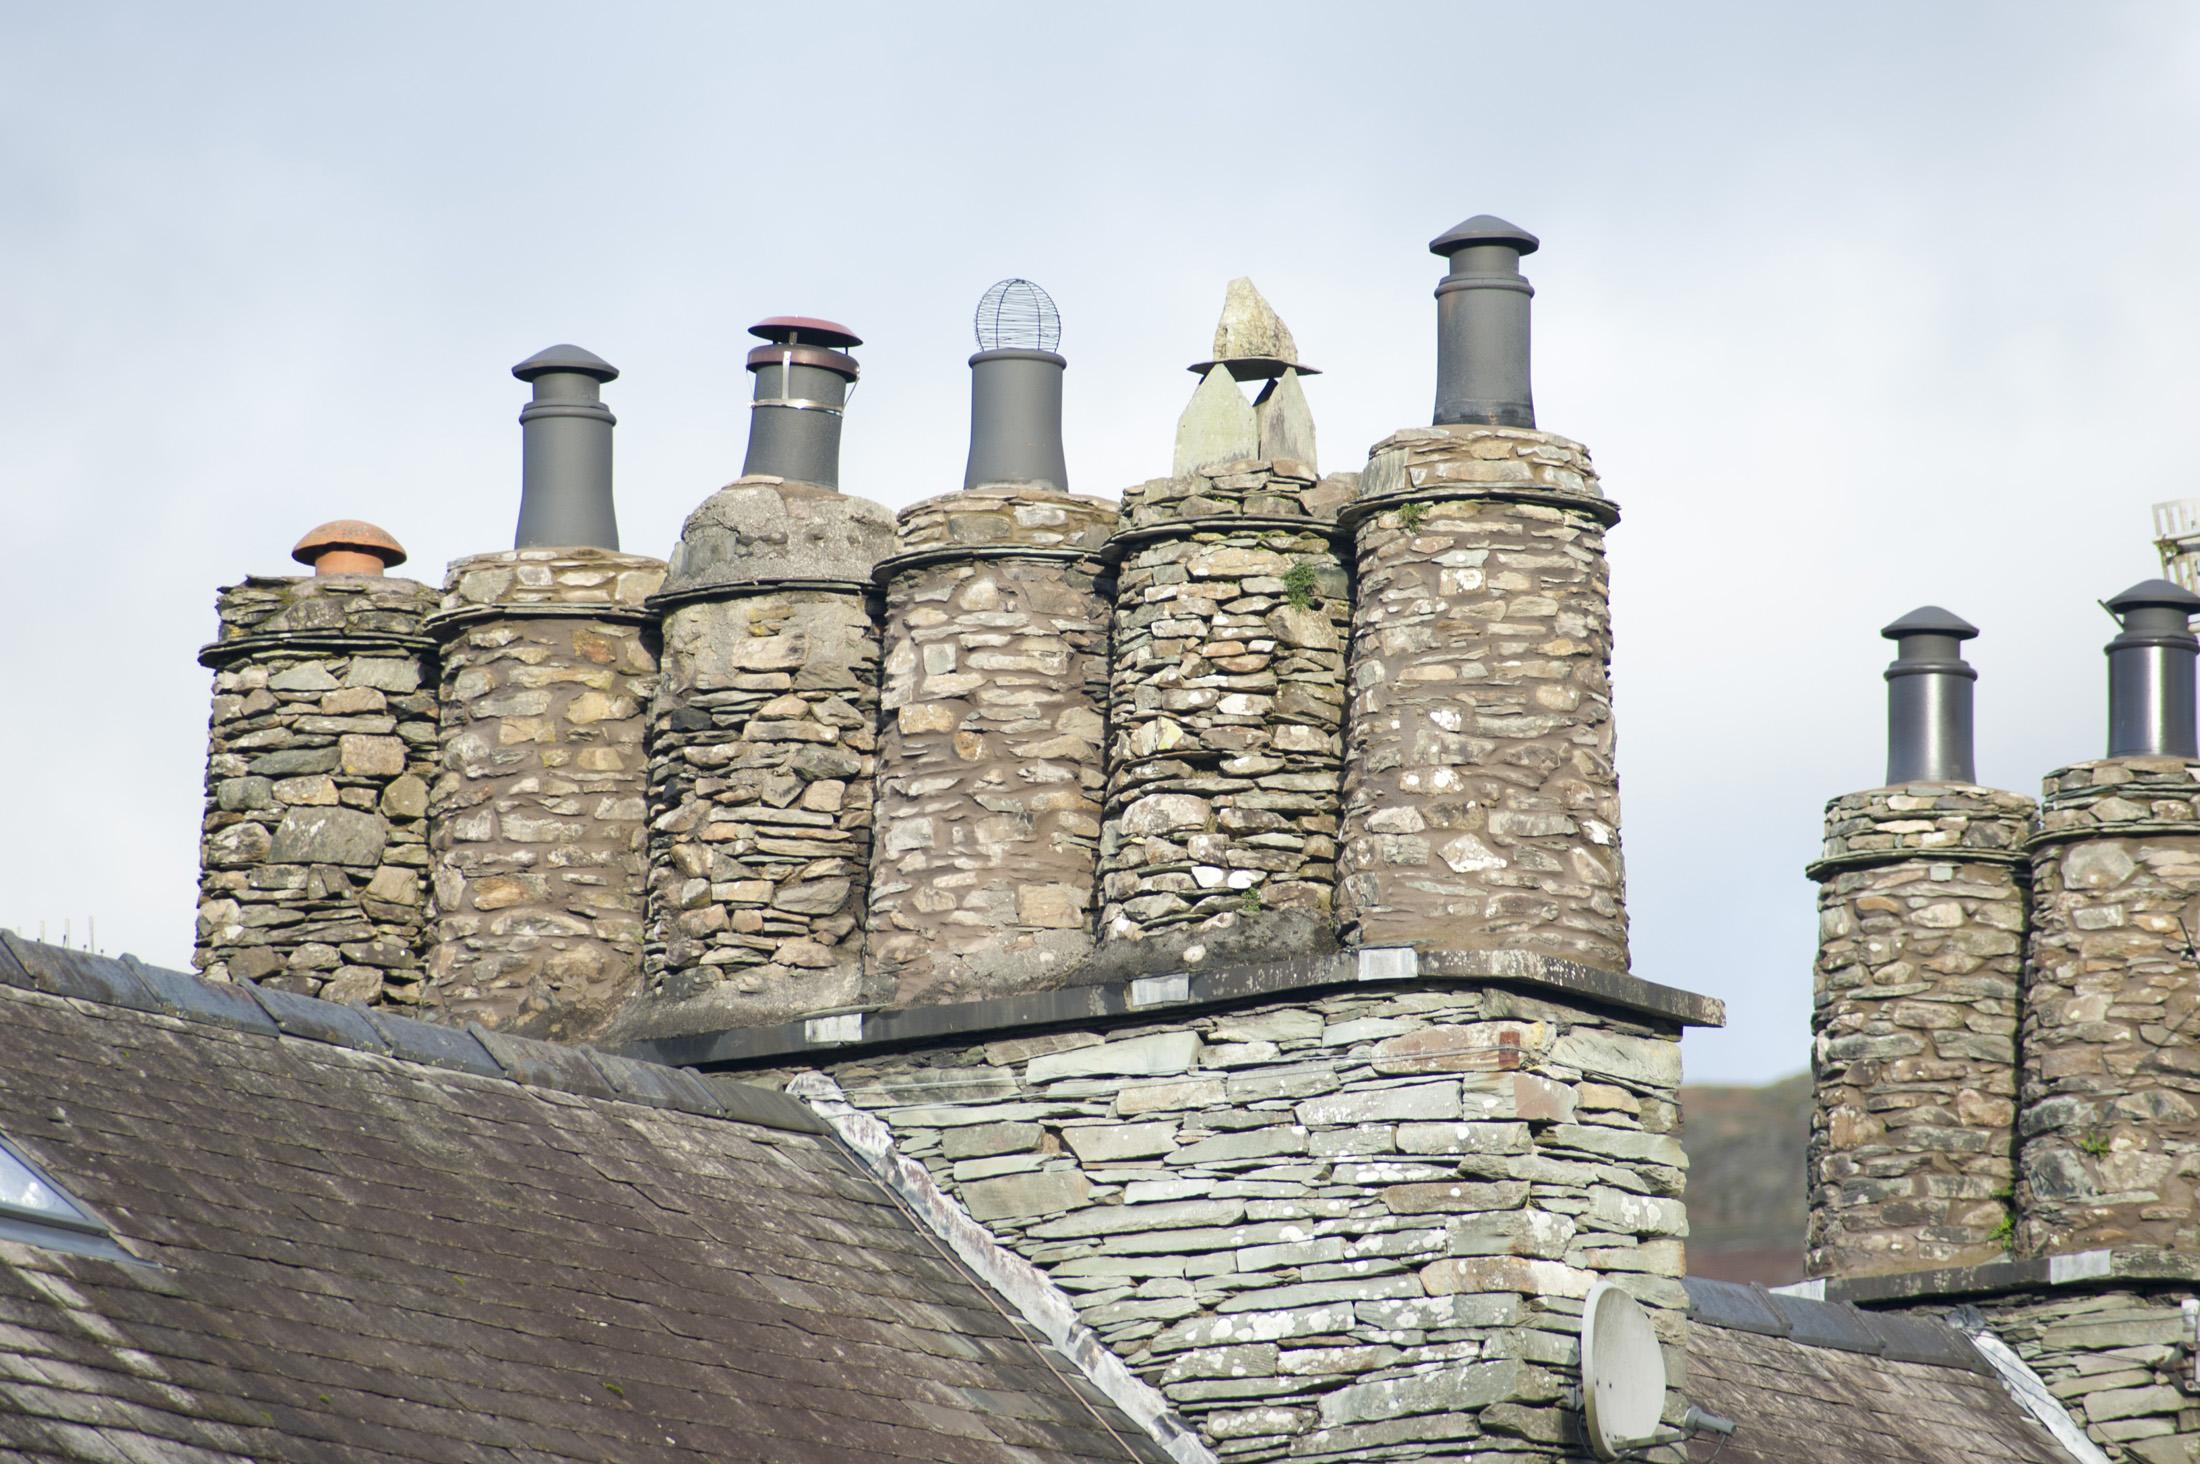 Free stock photo of cylindrical stone chimney pots for Stone chimneys